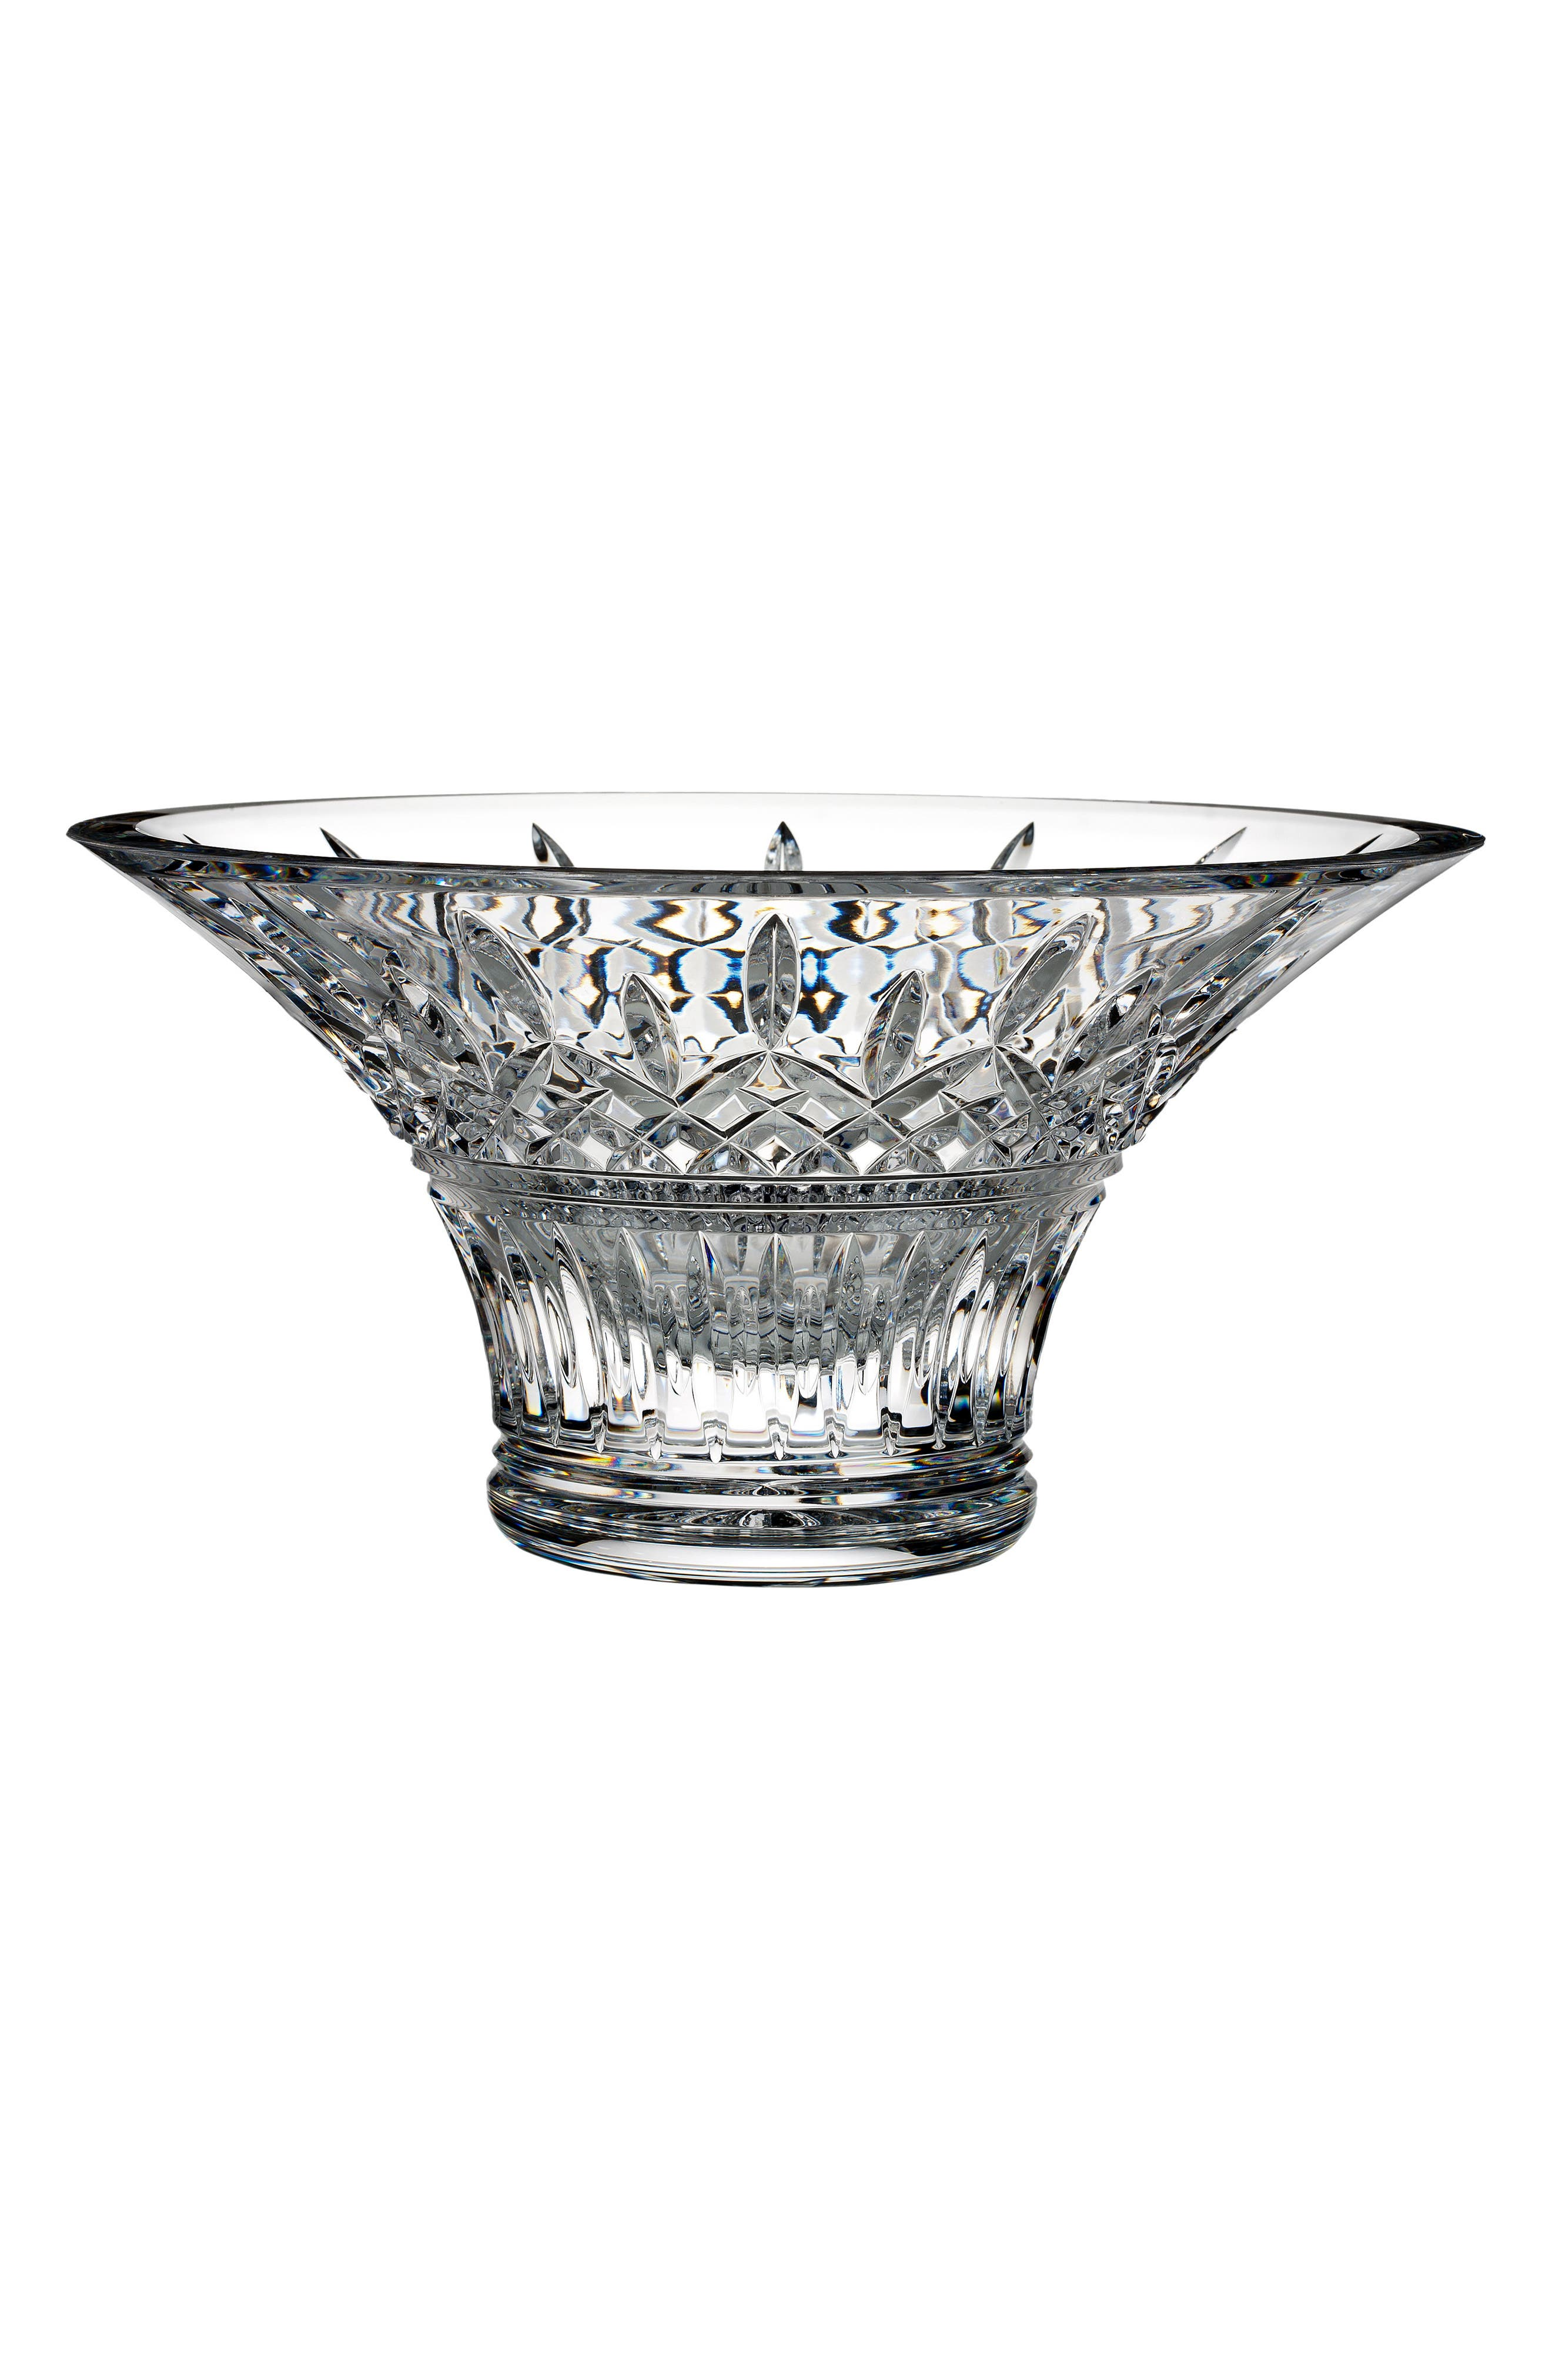 Main Image - Waterford Lismore Lead Crystal Bowl